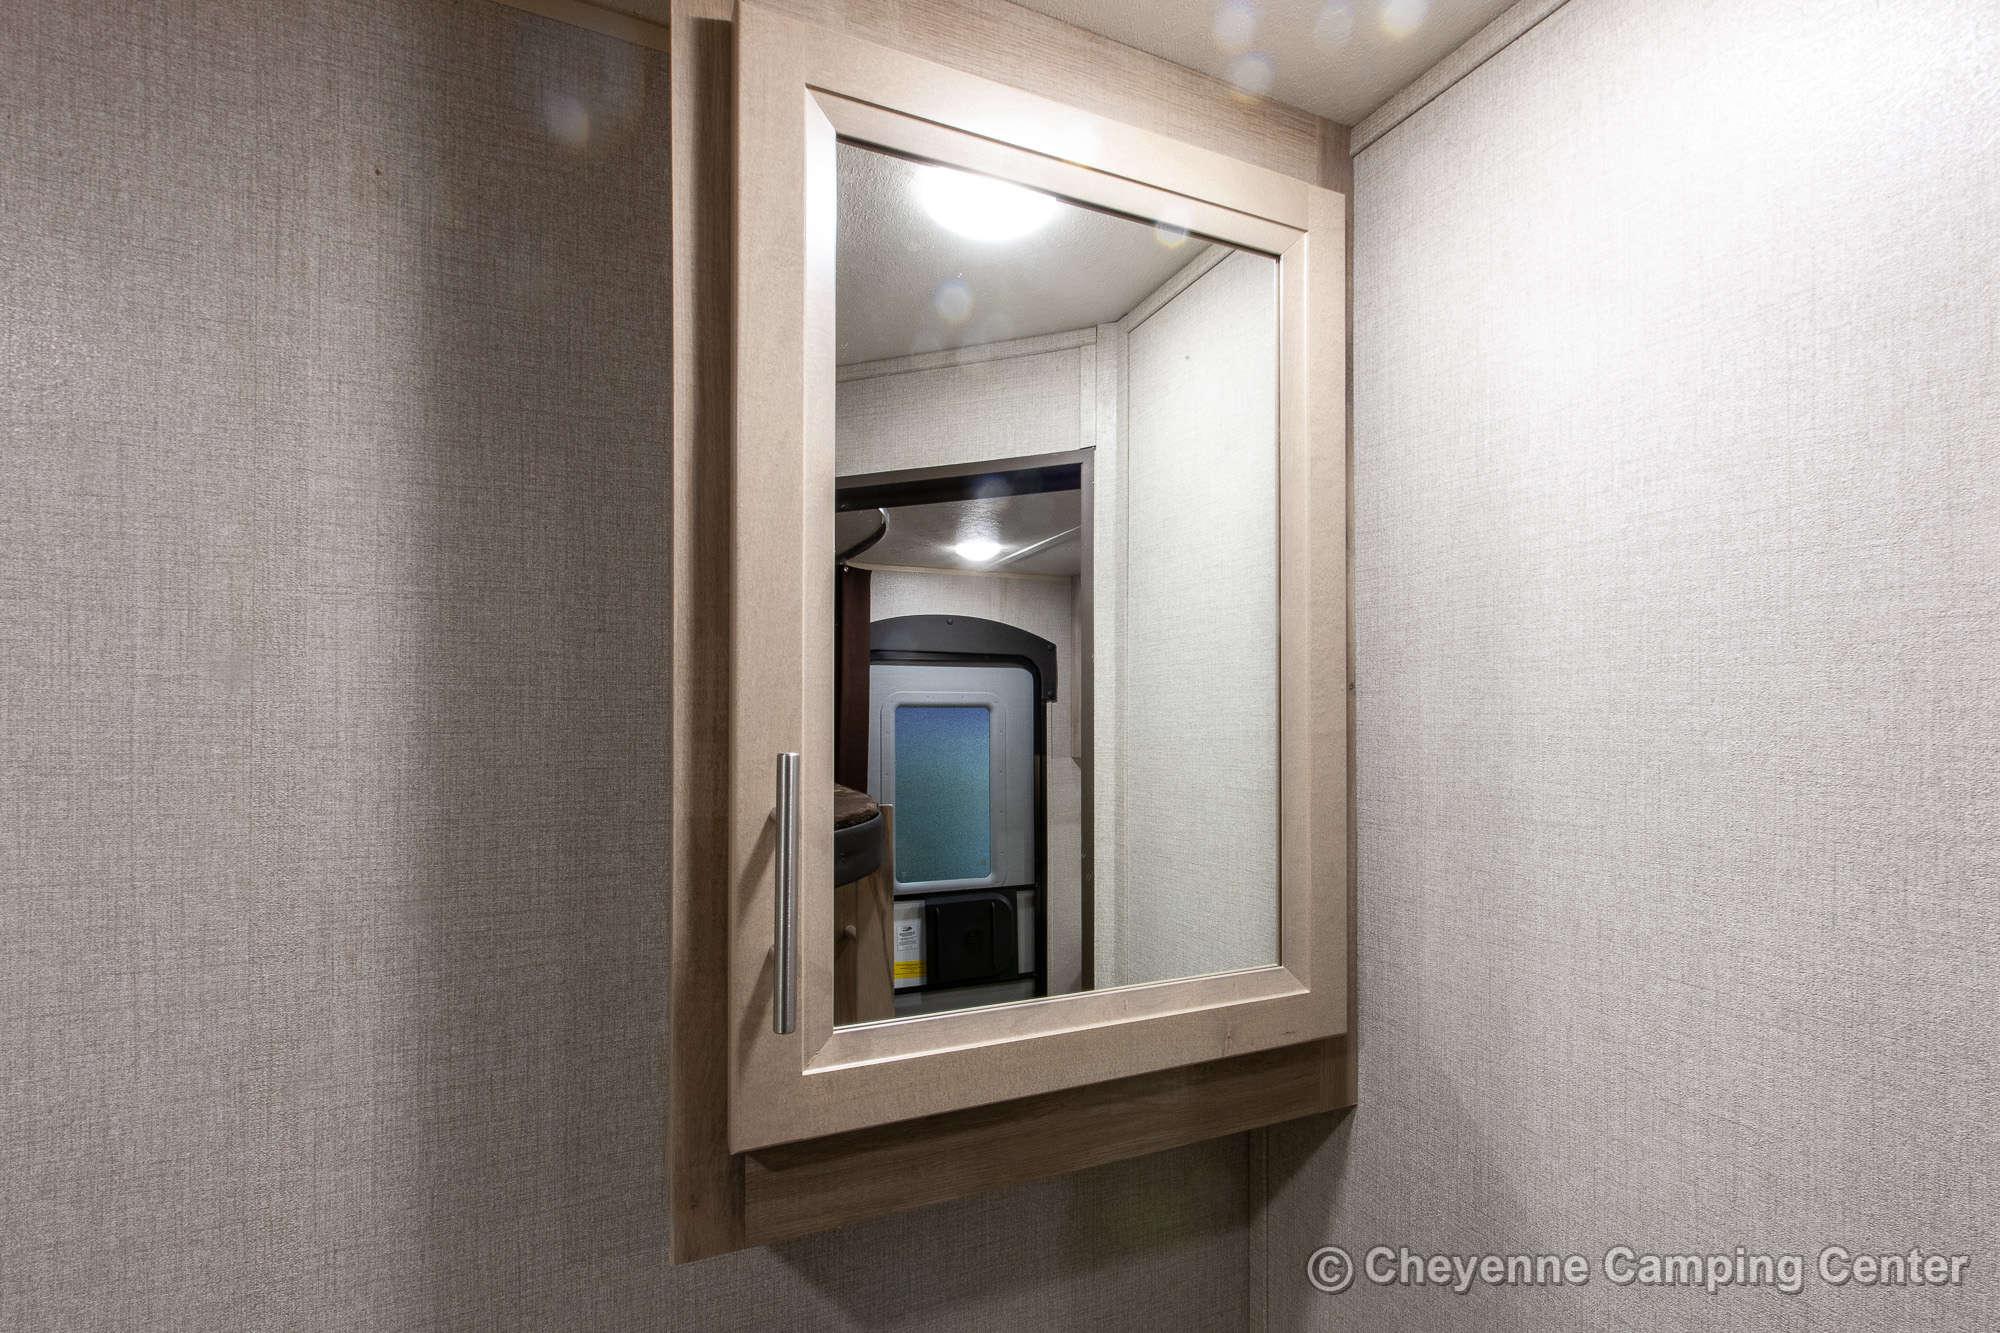 2021 Coachmen Catalina Legacy Edition 263BHSCK Bunkhouse Travel Trailer Interior Image